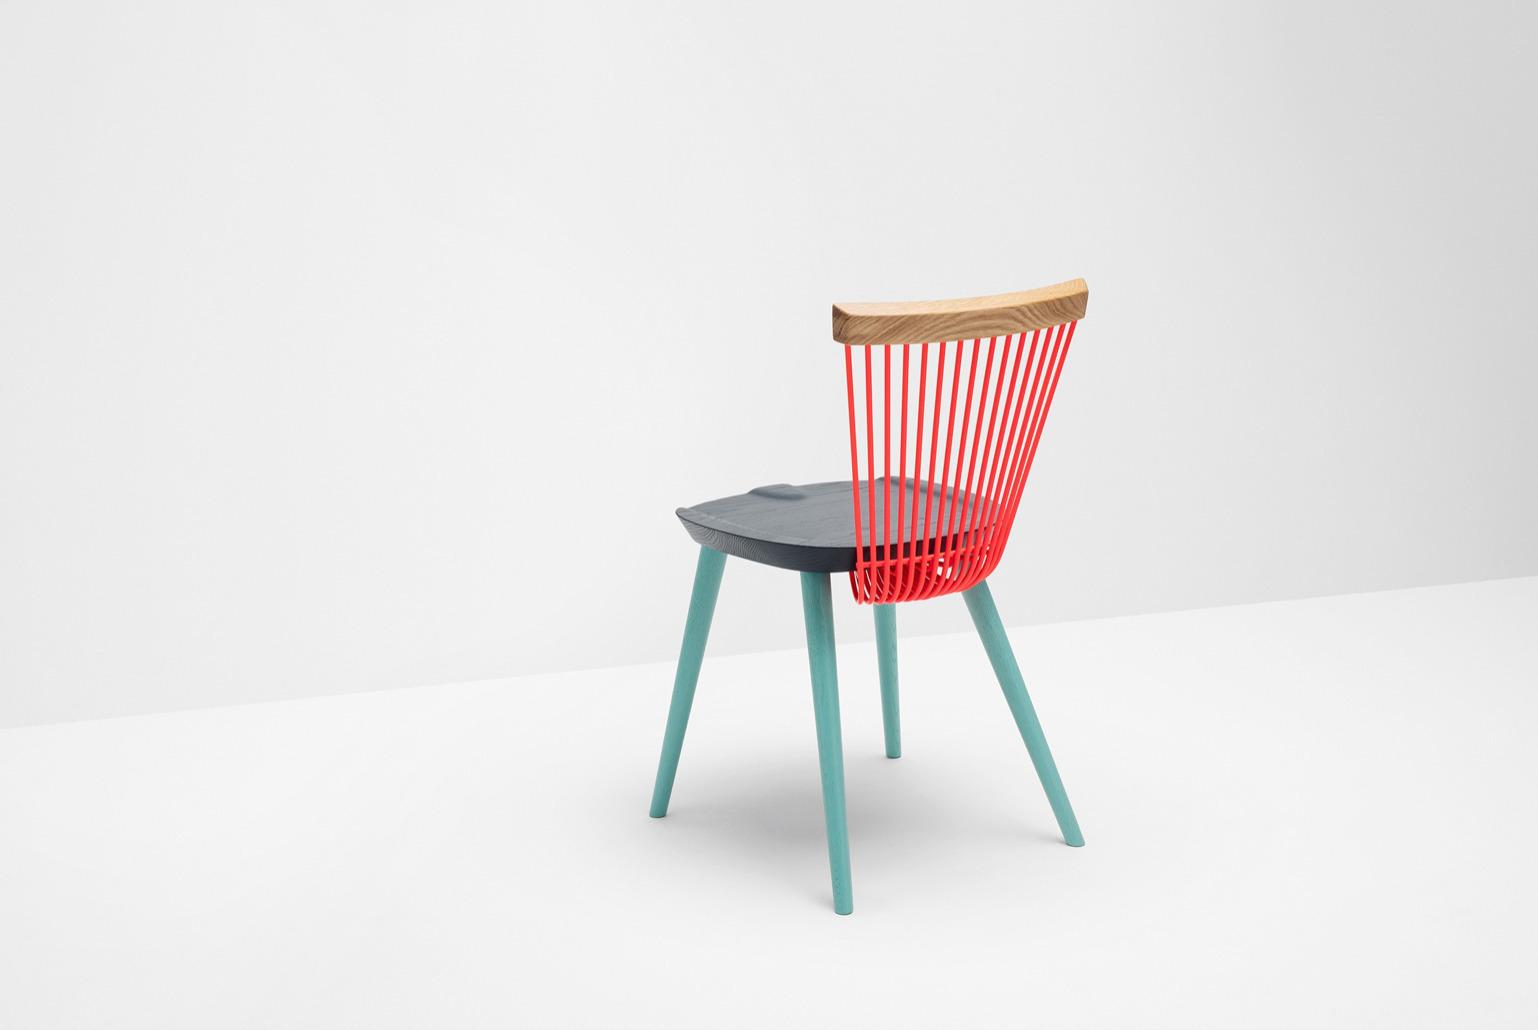 WW Chair Colour Series Hierve | - rachelmauricio | ello